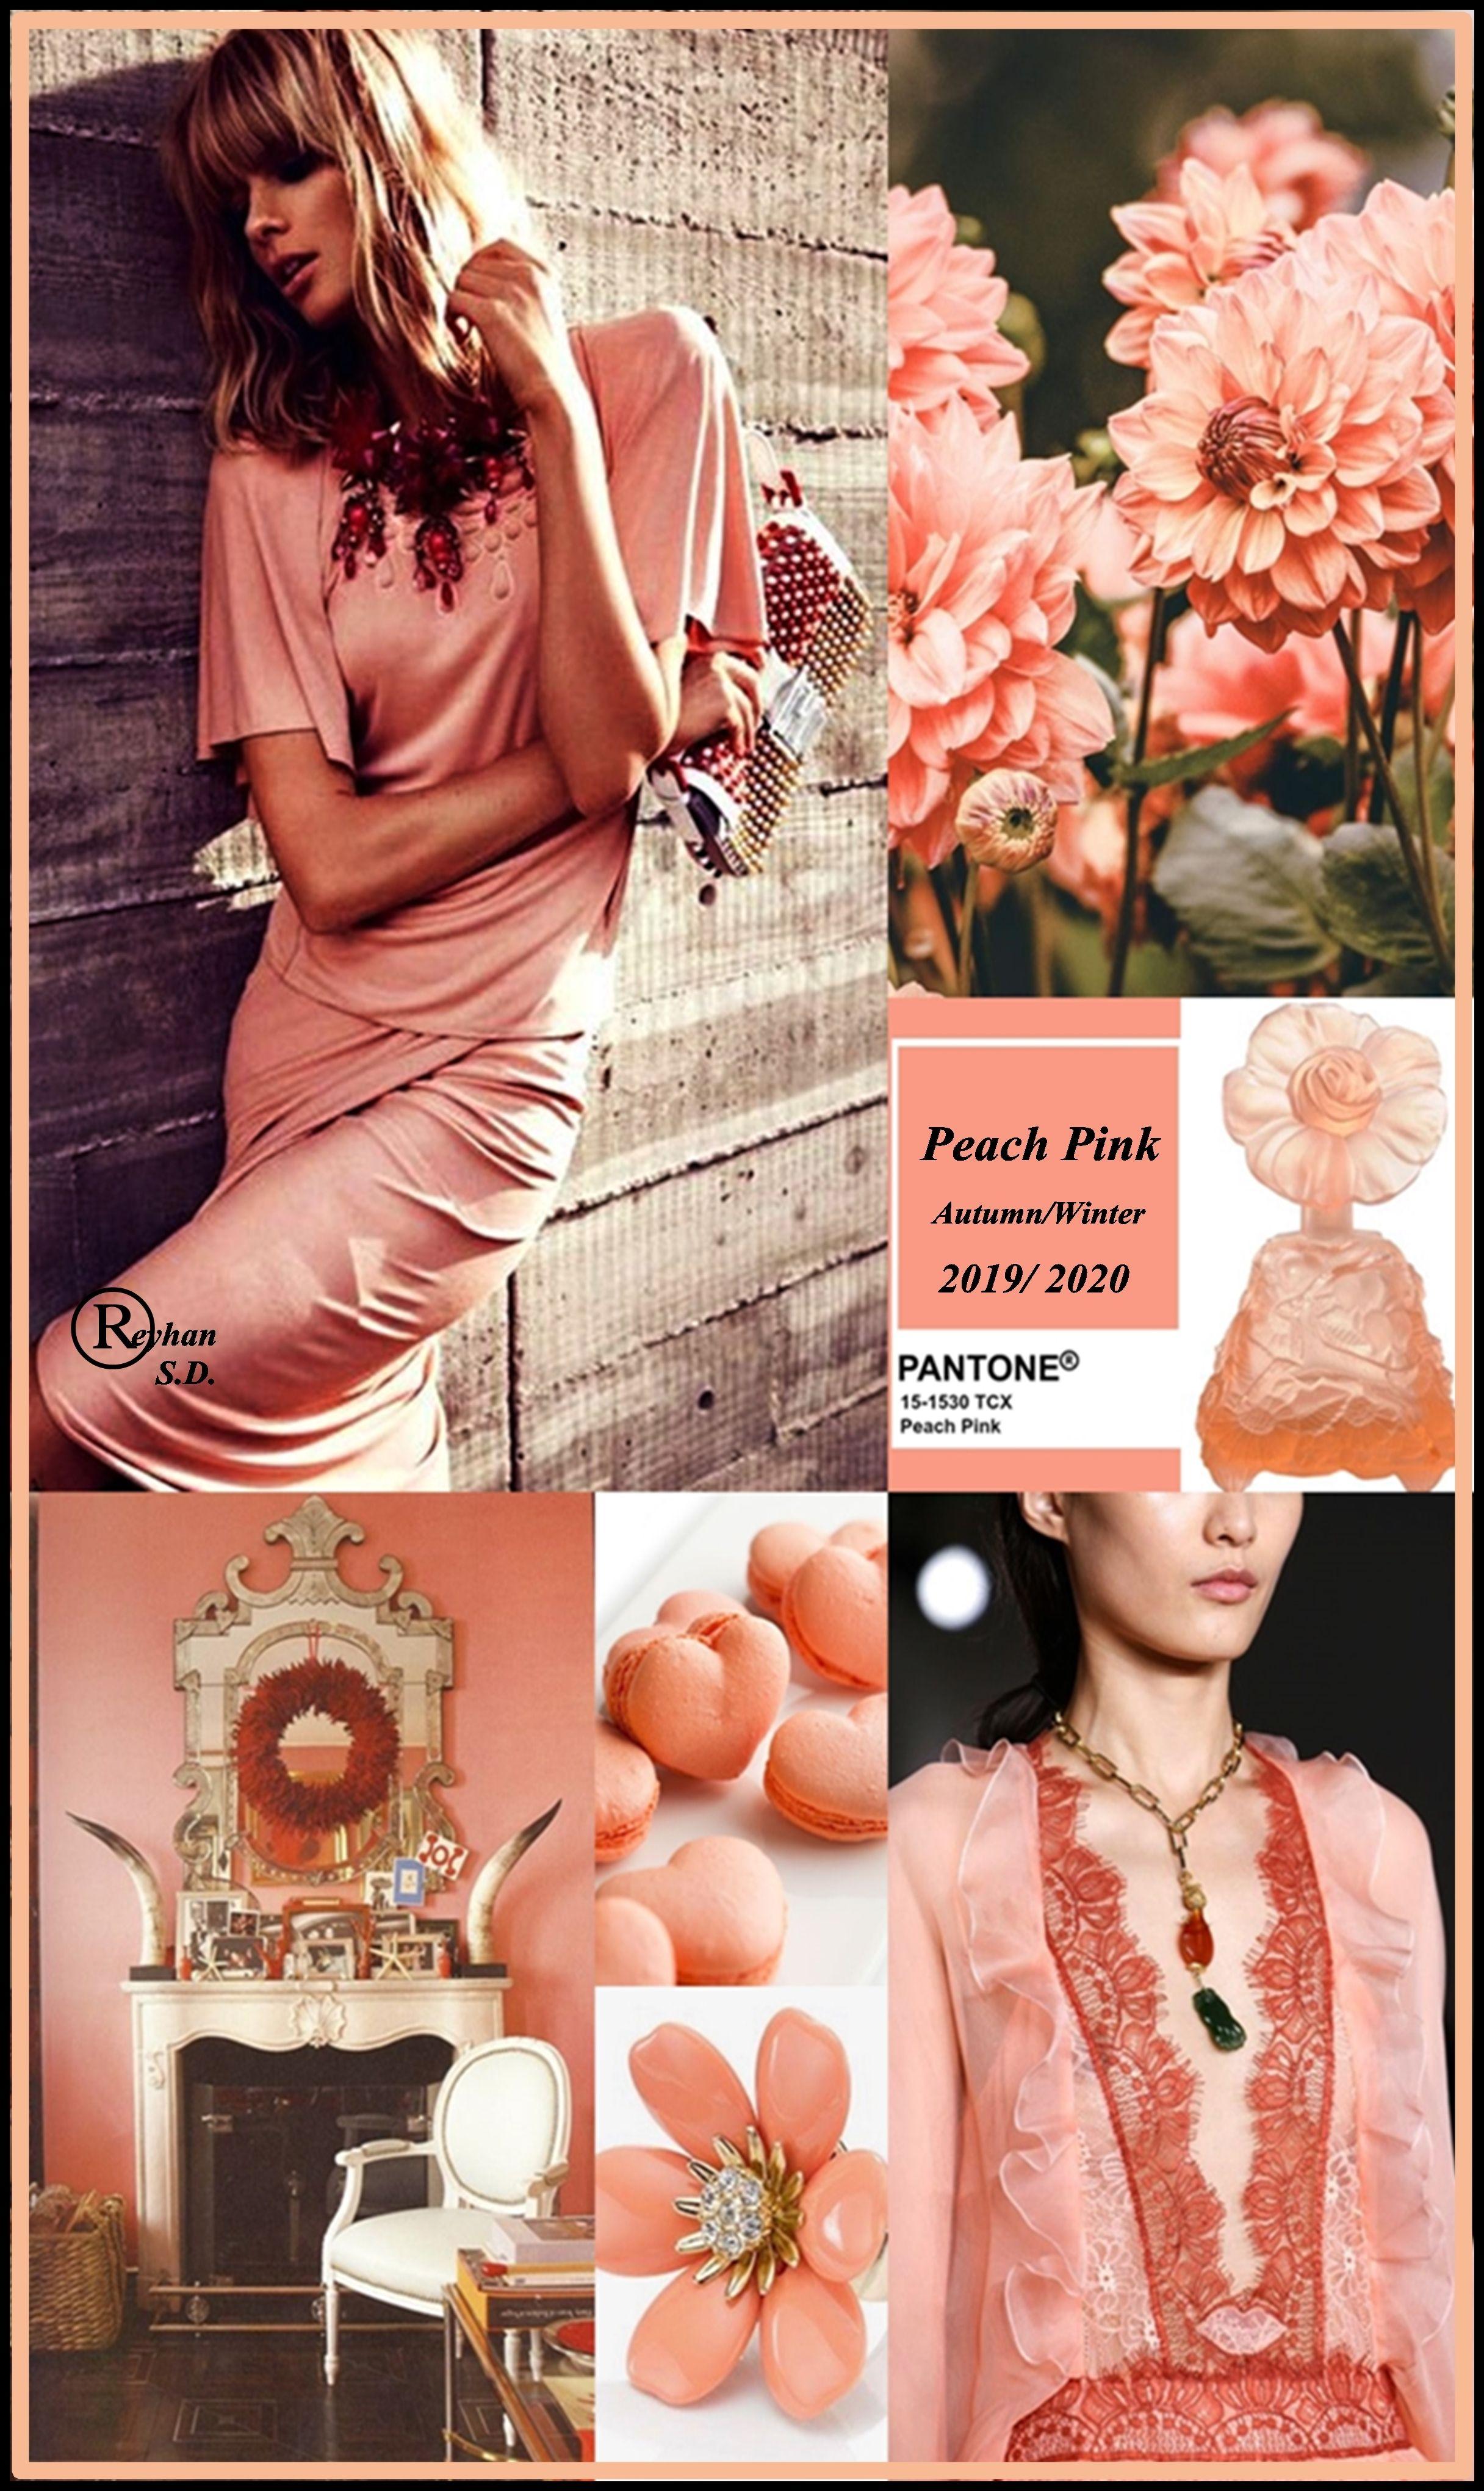 '' Peach Pink '' Pantone – Autumn / Winter 2019/2020 Color '' di Reyhan S.D.